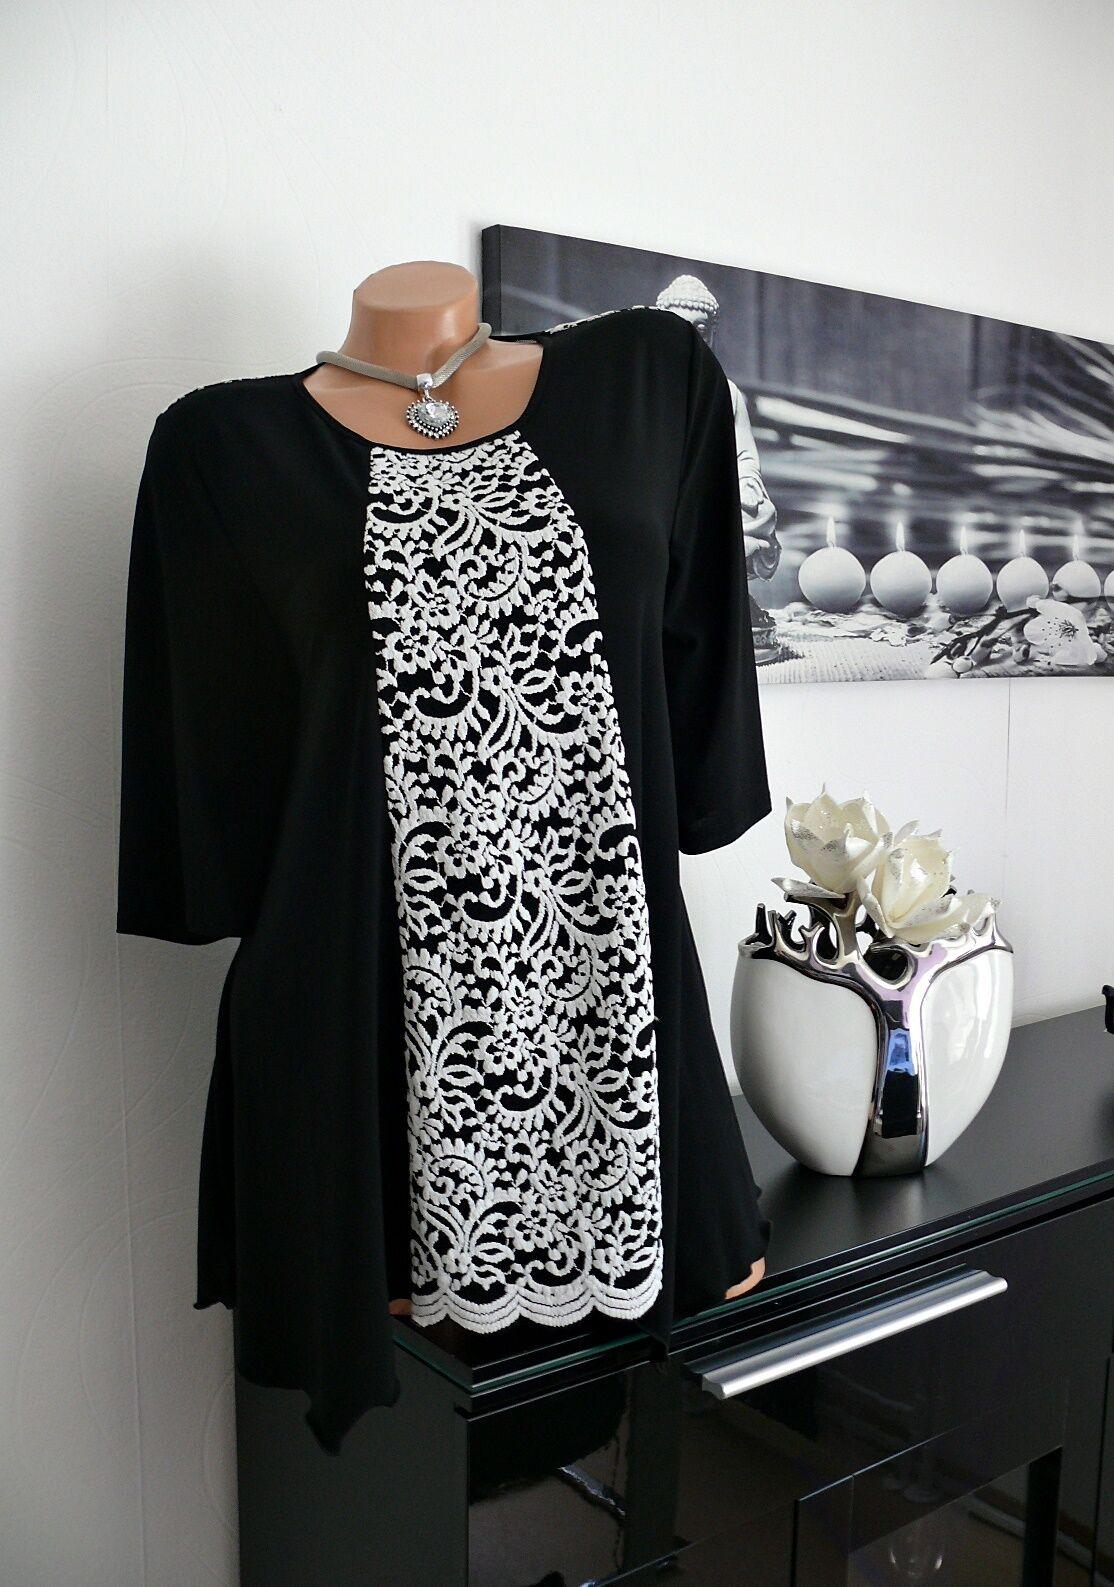 ♥ NEU Fest    Tunika Spitze schwarz elegant  3 4 arm 42 44 46 48 50 gr ♥ | Mode-Muster  | Sale Online Shop  892eab